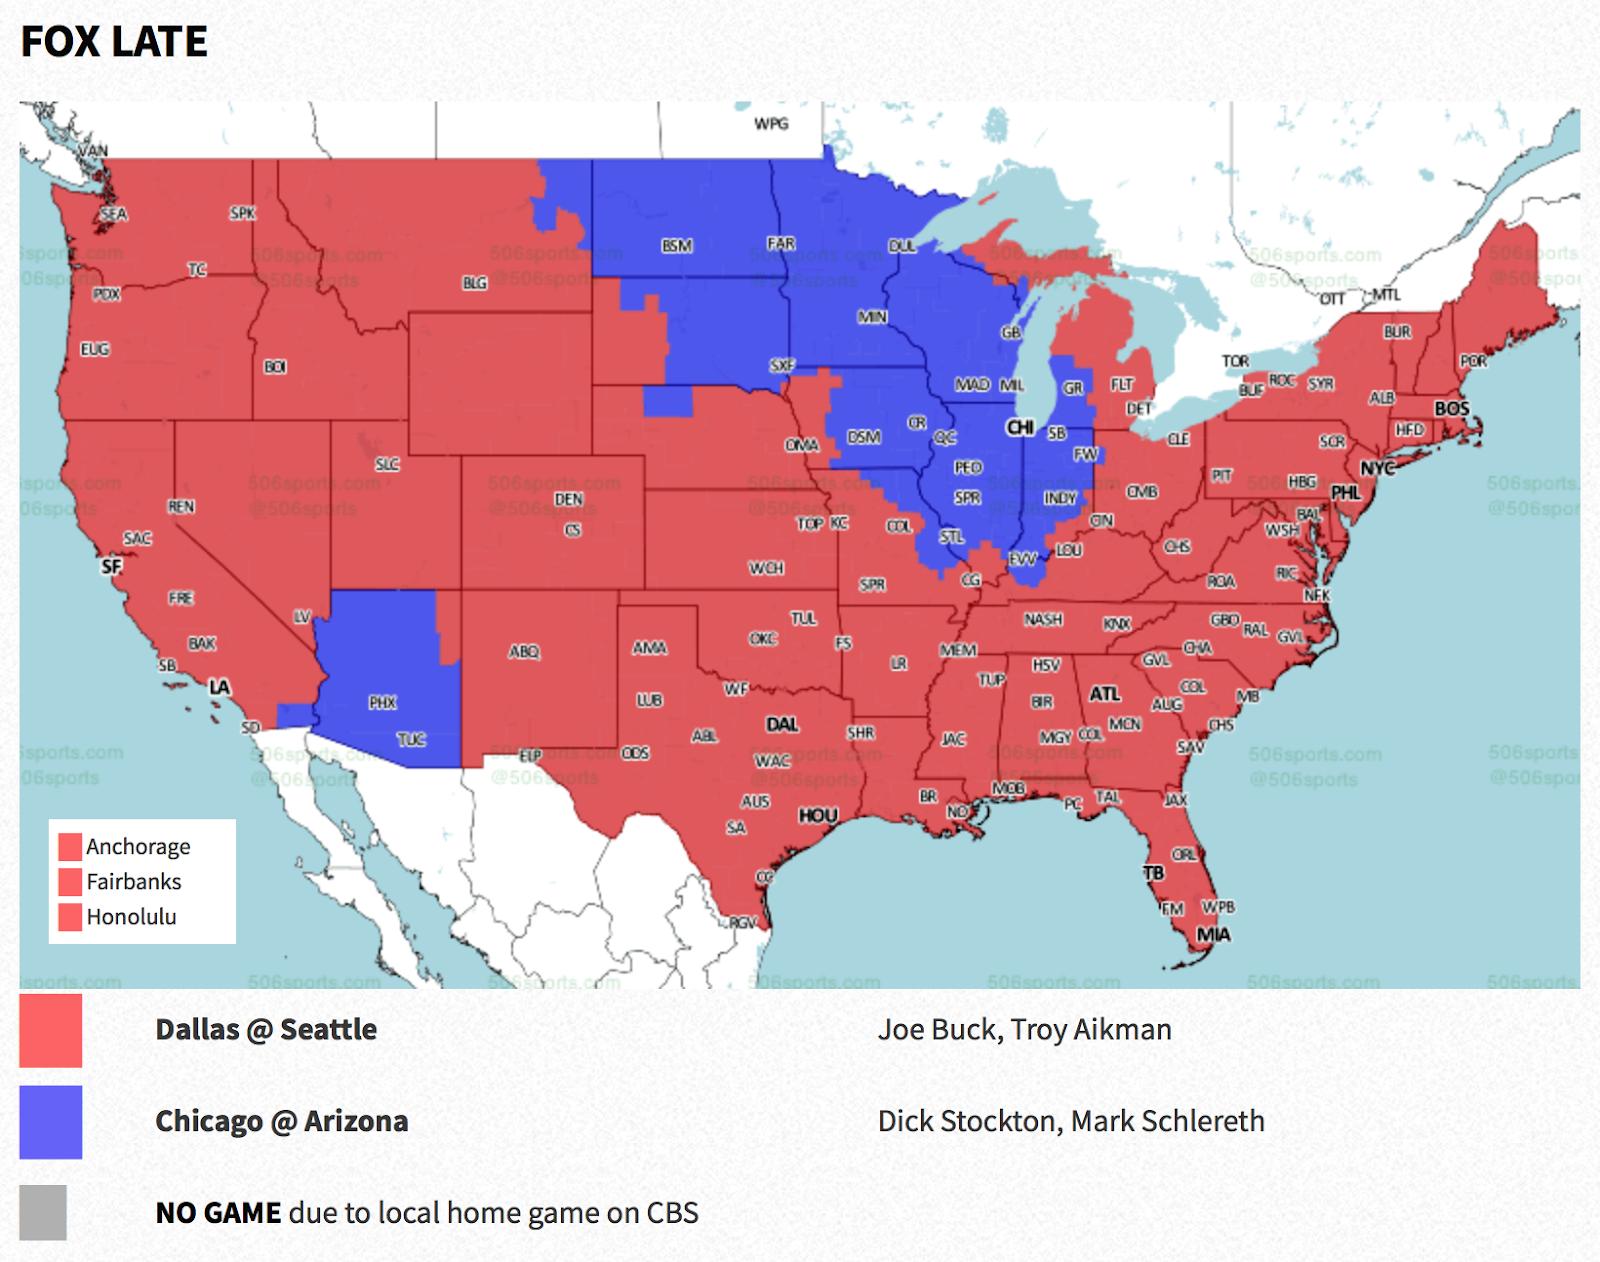 maps courtesy of 506 sports